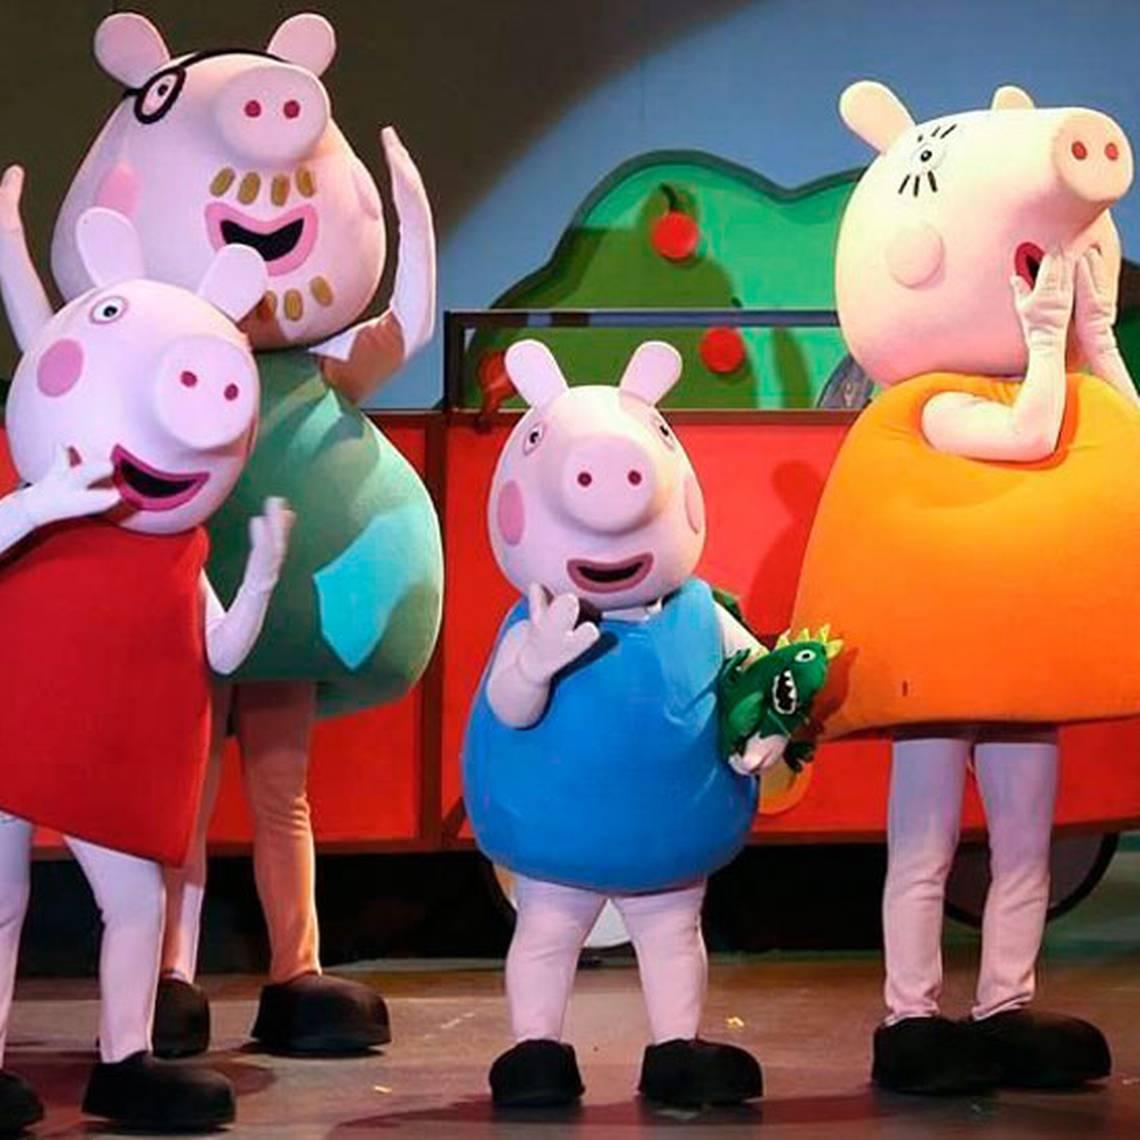 El show de Peppa Pig vuelve a Chile